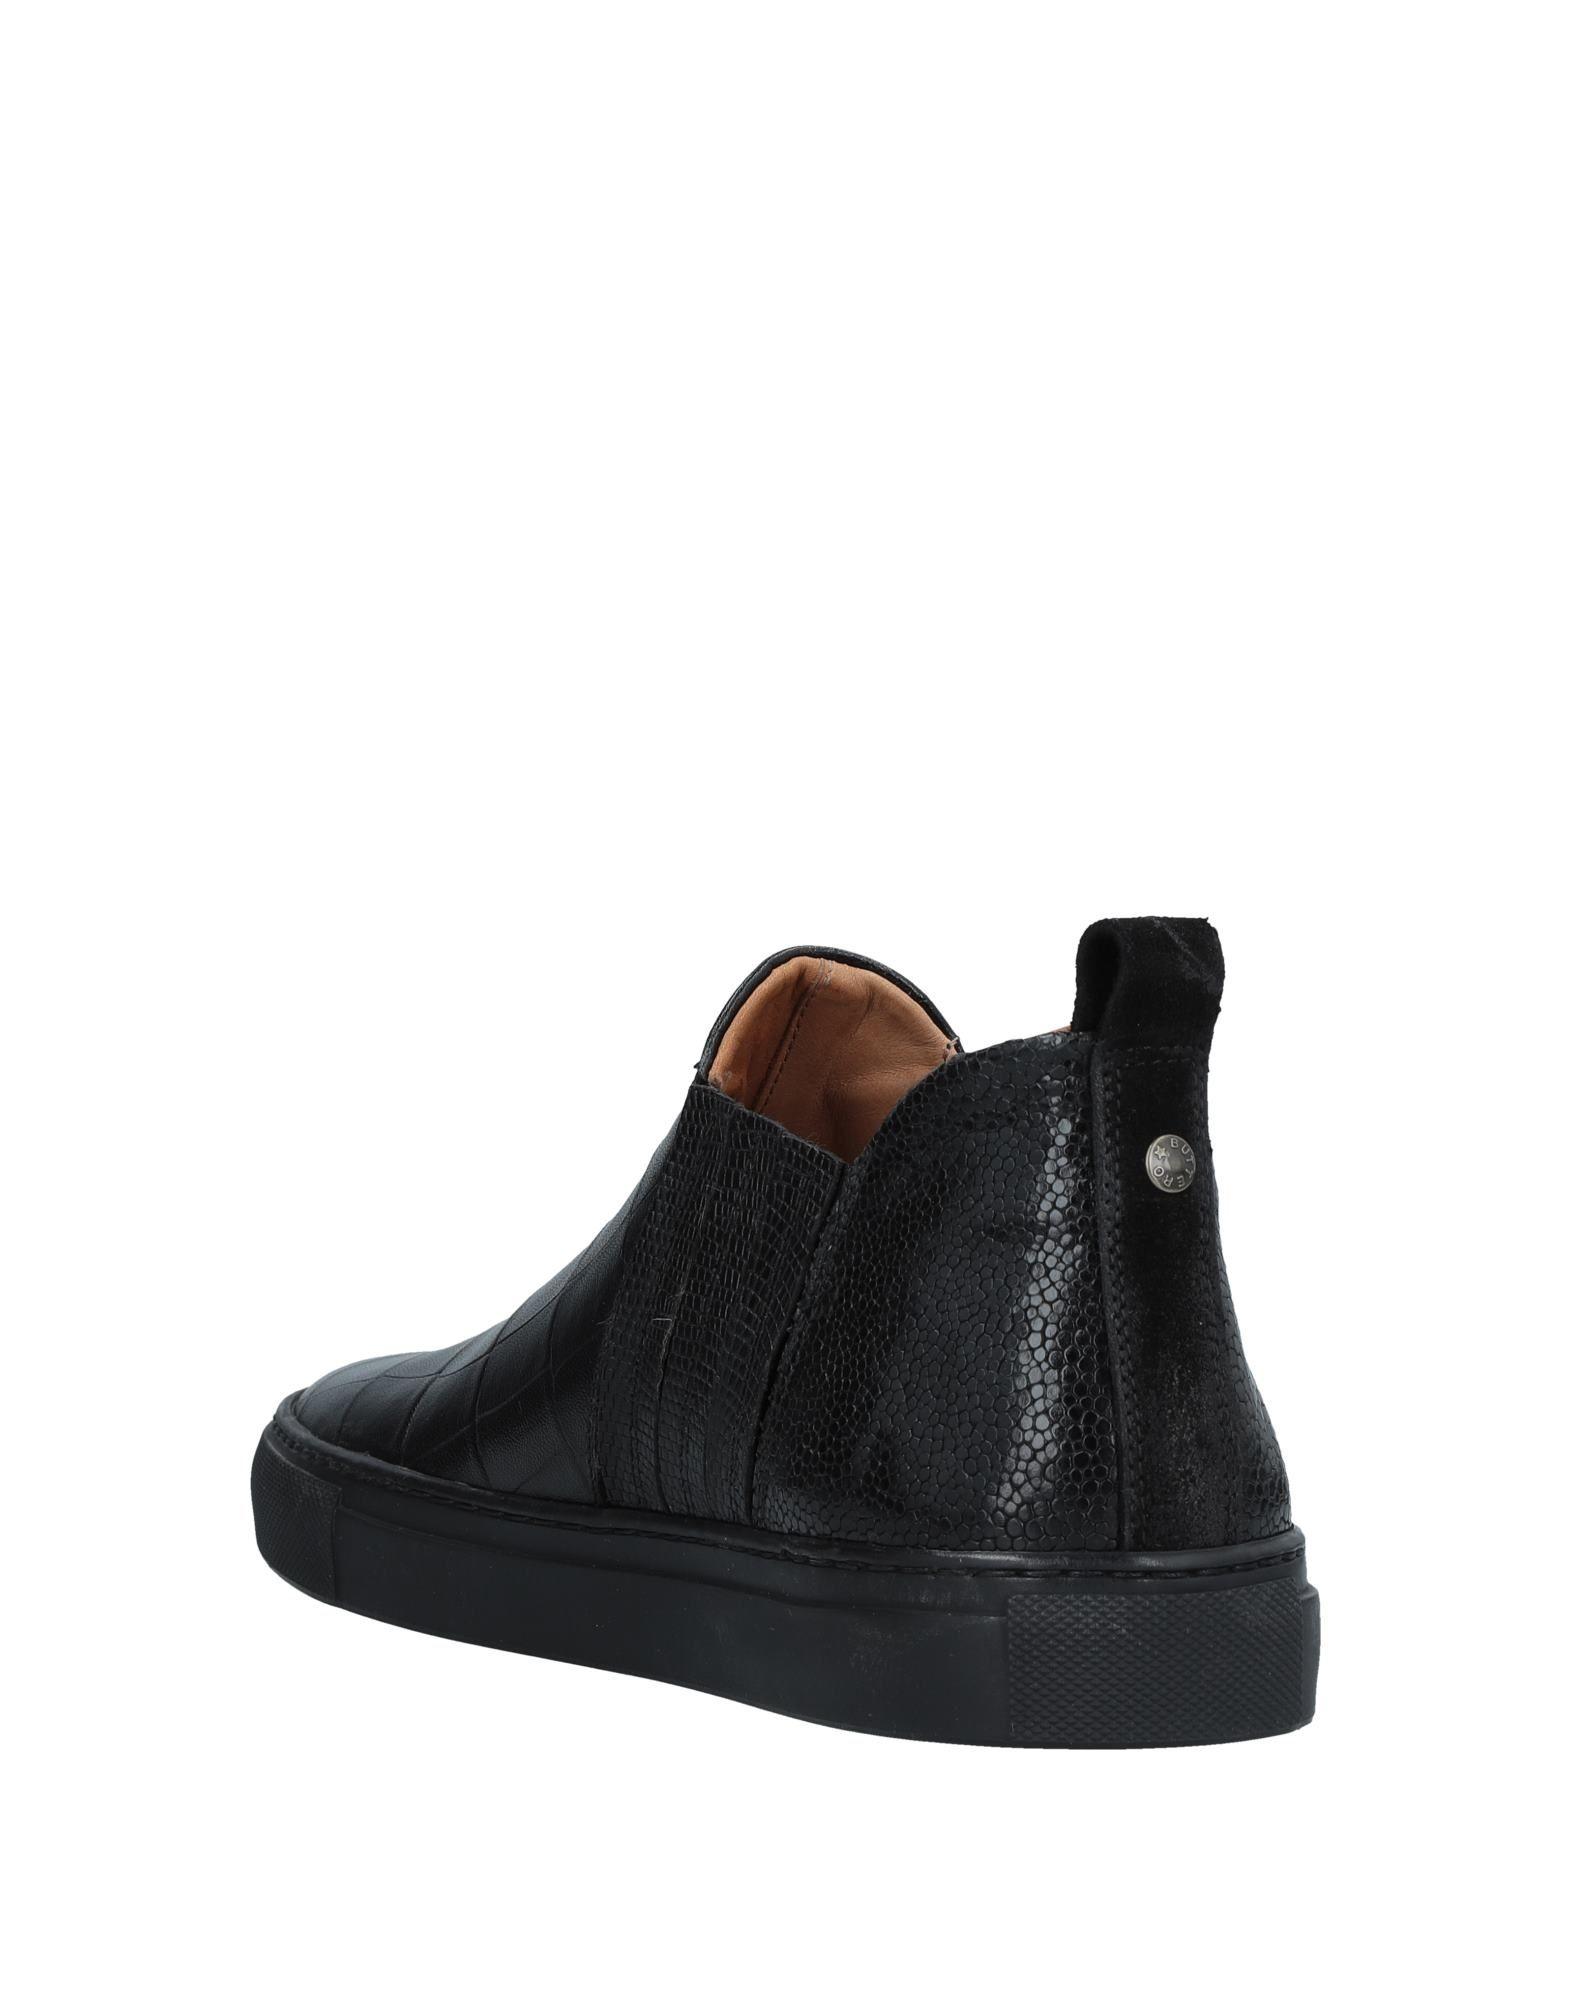 Buttero® Sneakers Damen  11537291BHGut aussehende strapazierfähige Schuhe